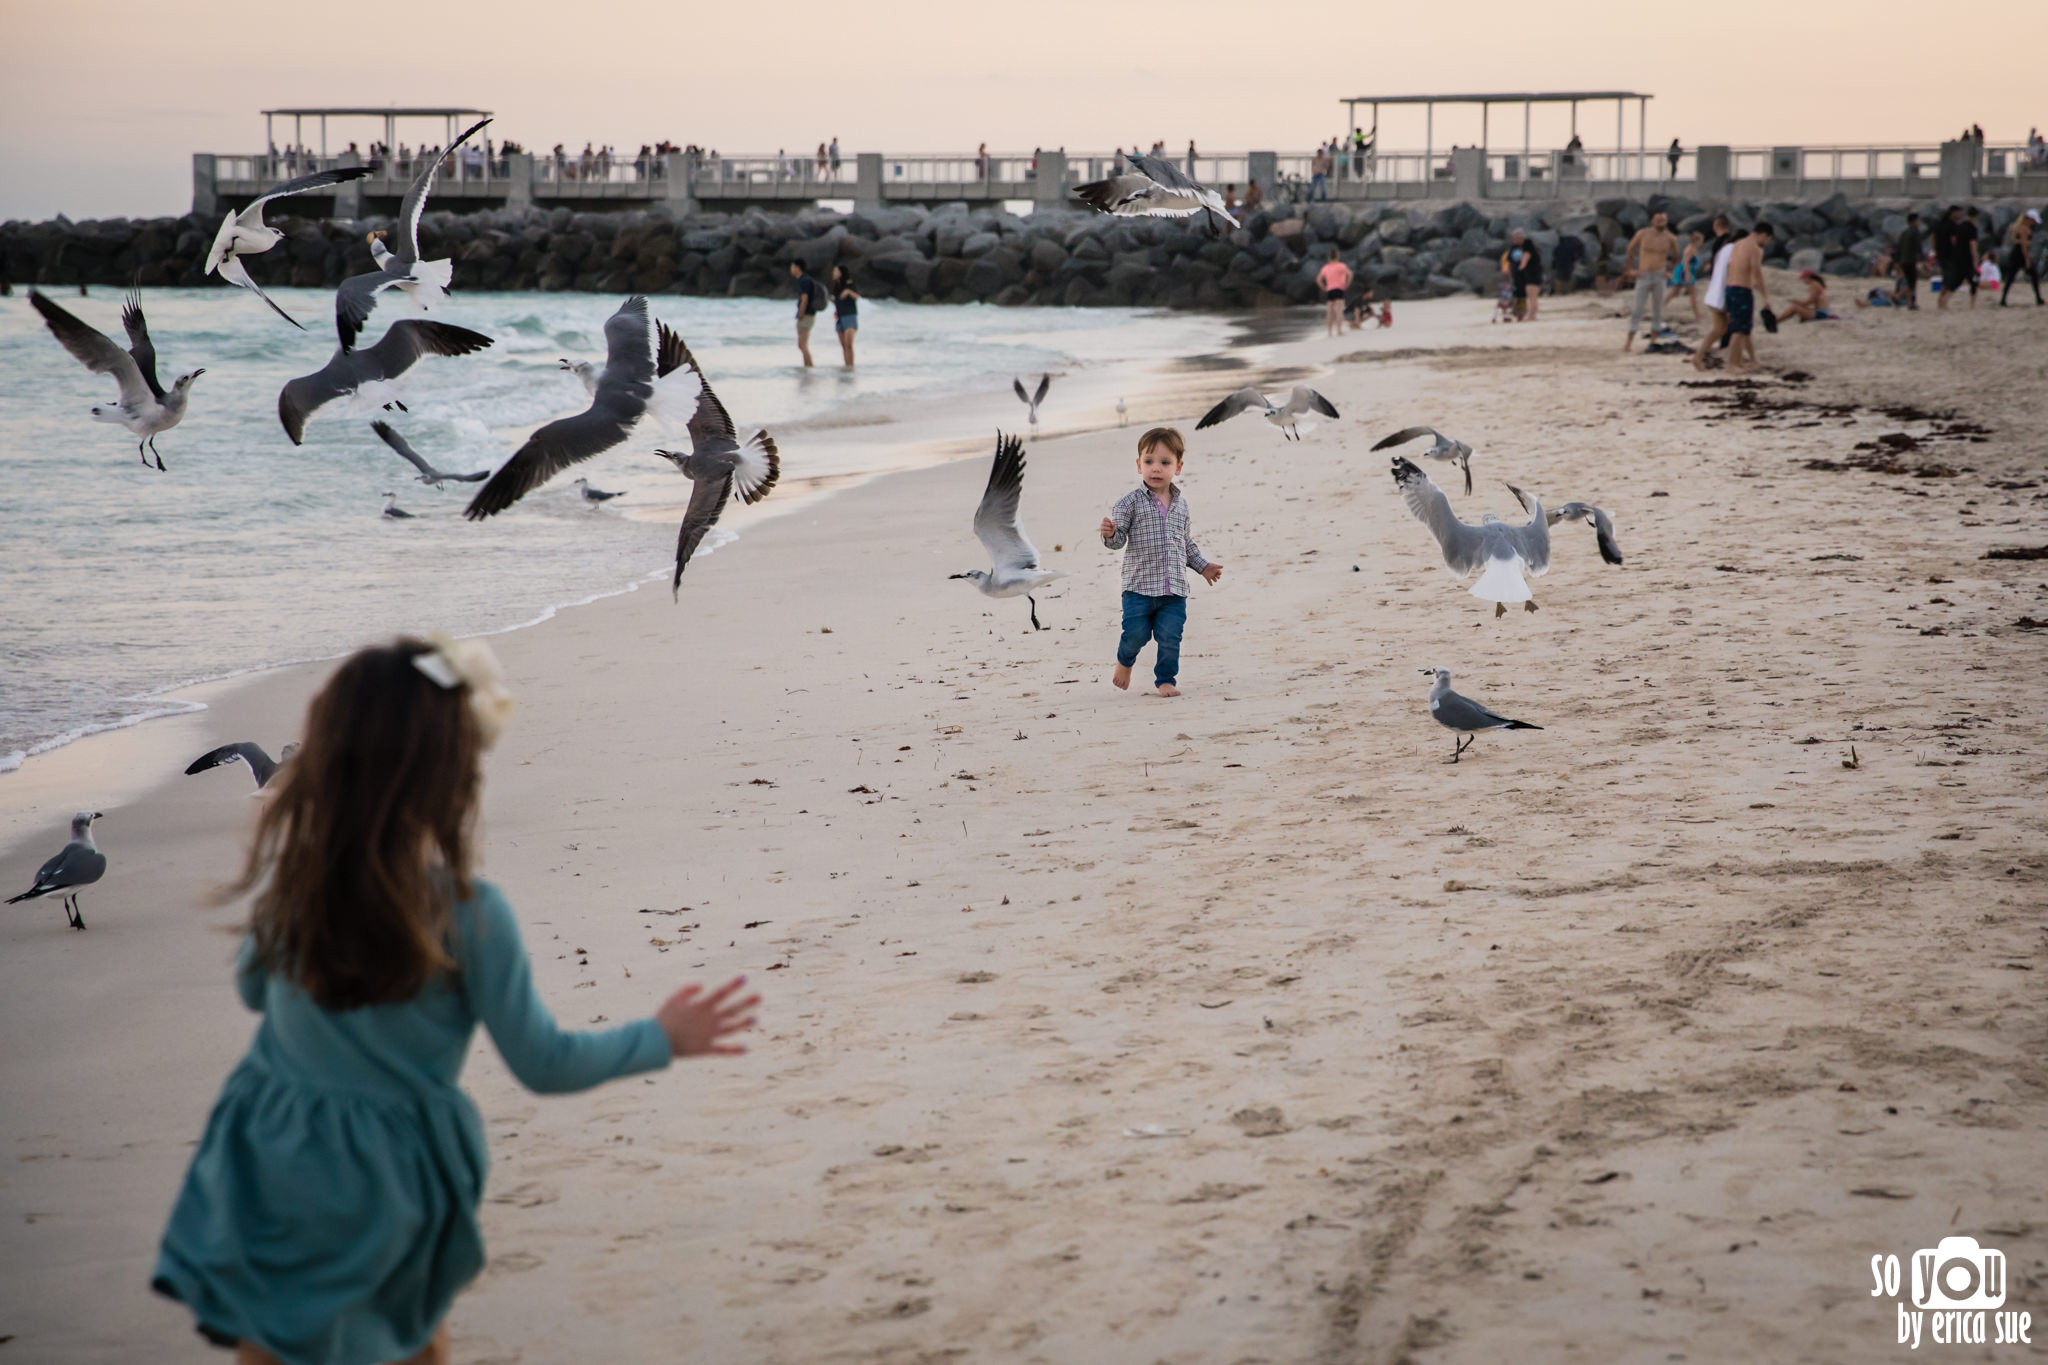 so-you-by-erica-sue-miami-maternity-photographer-south-pointe-park-9581.jpg